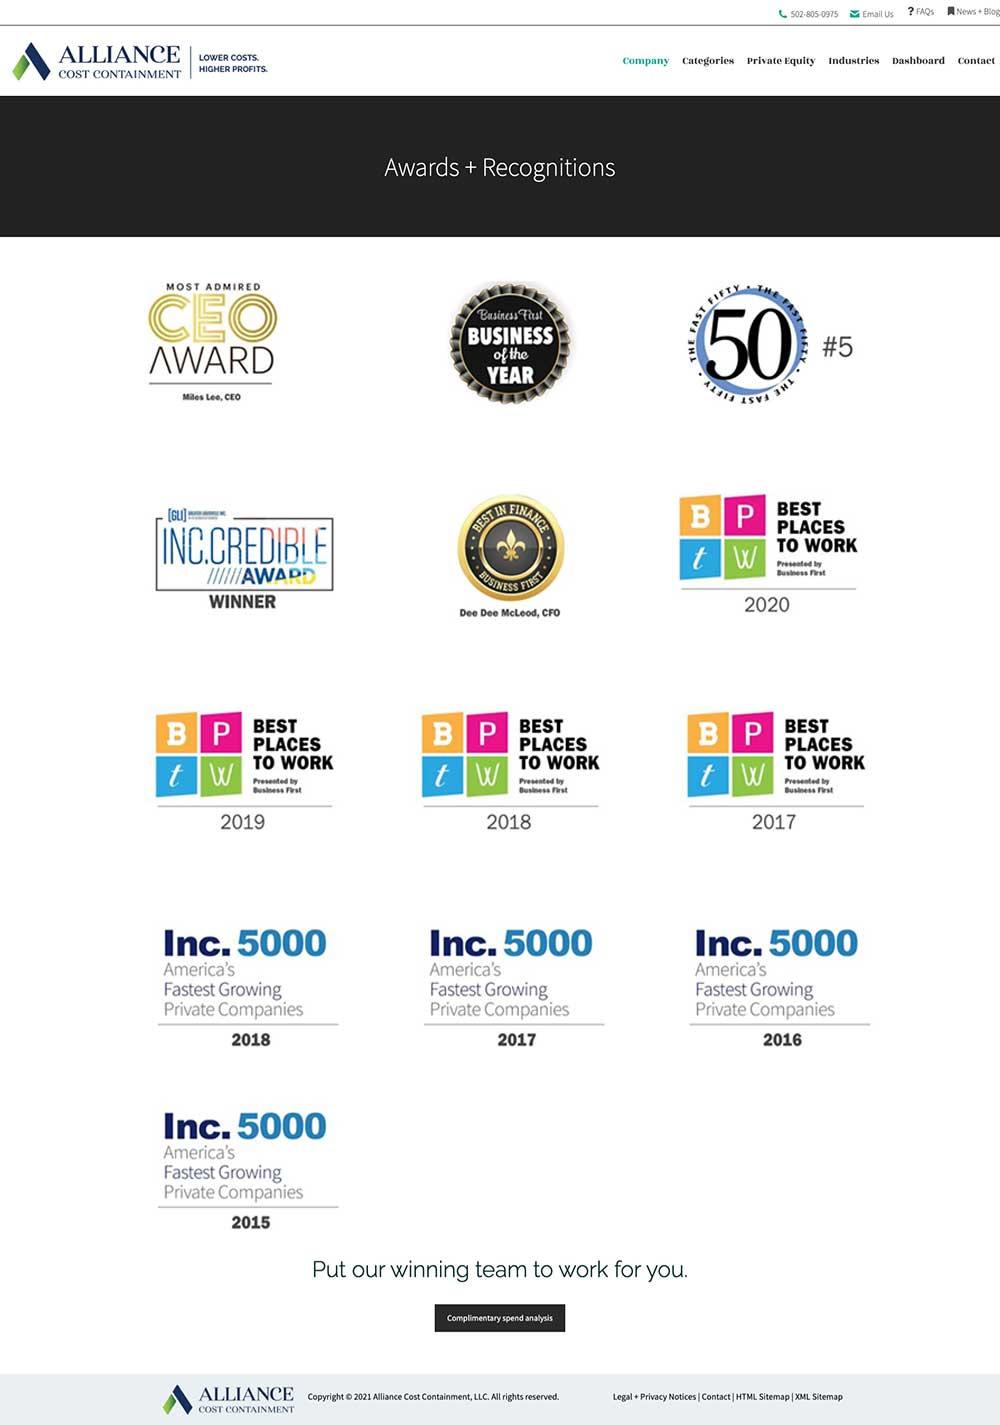 Screenshot of ACC awards page wordpress website design